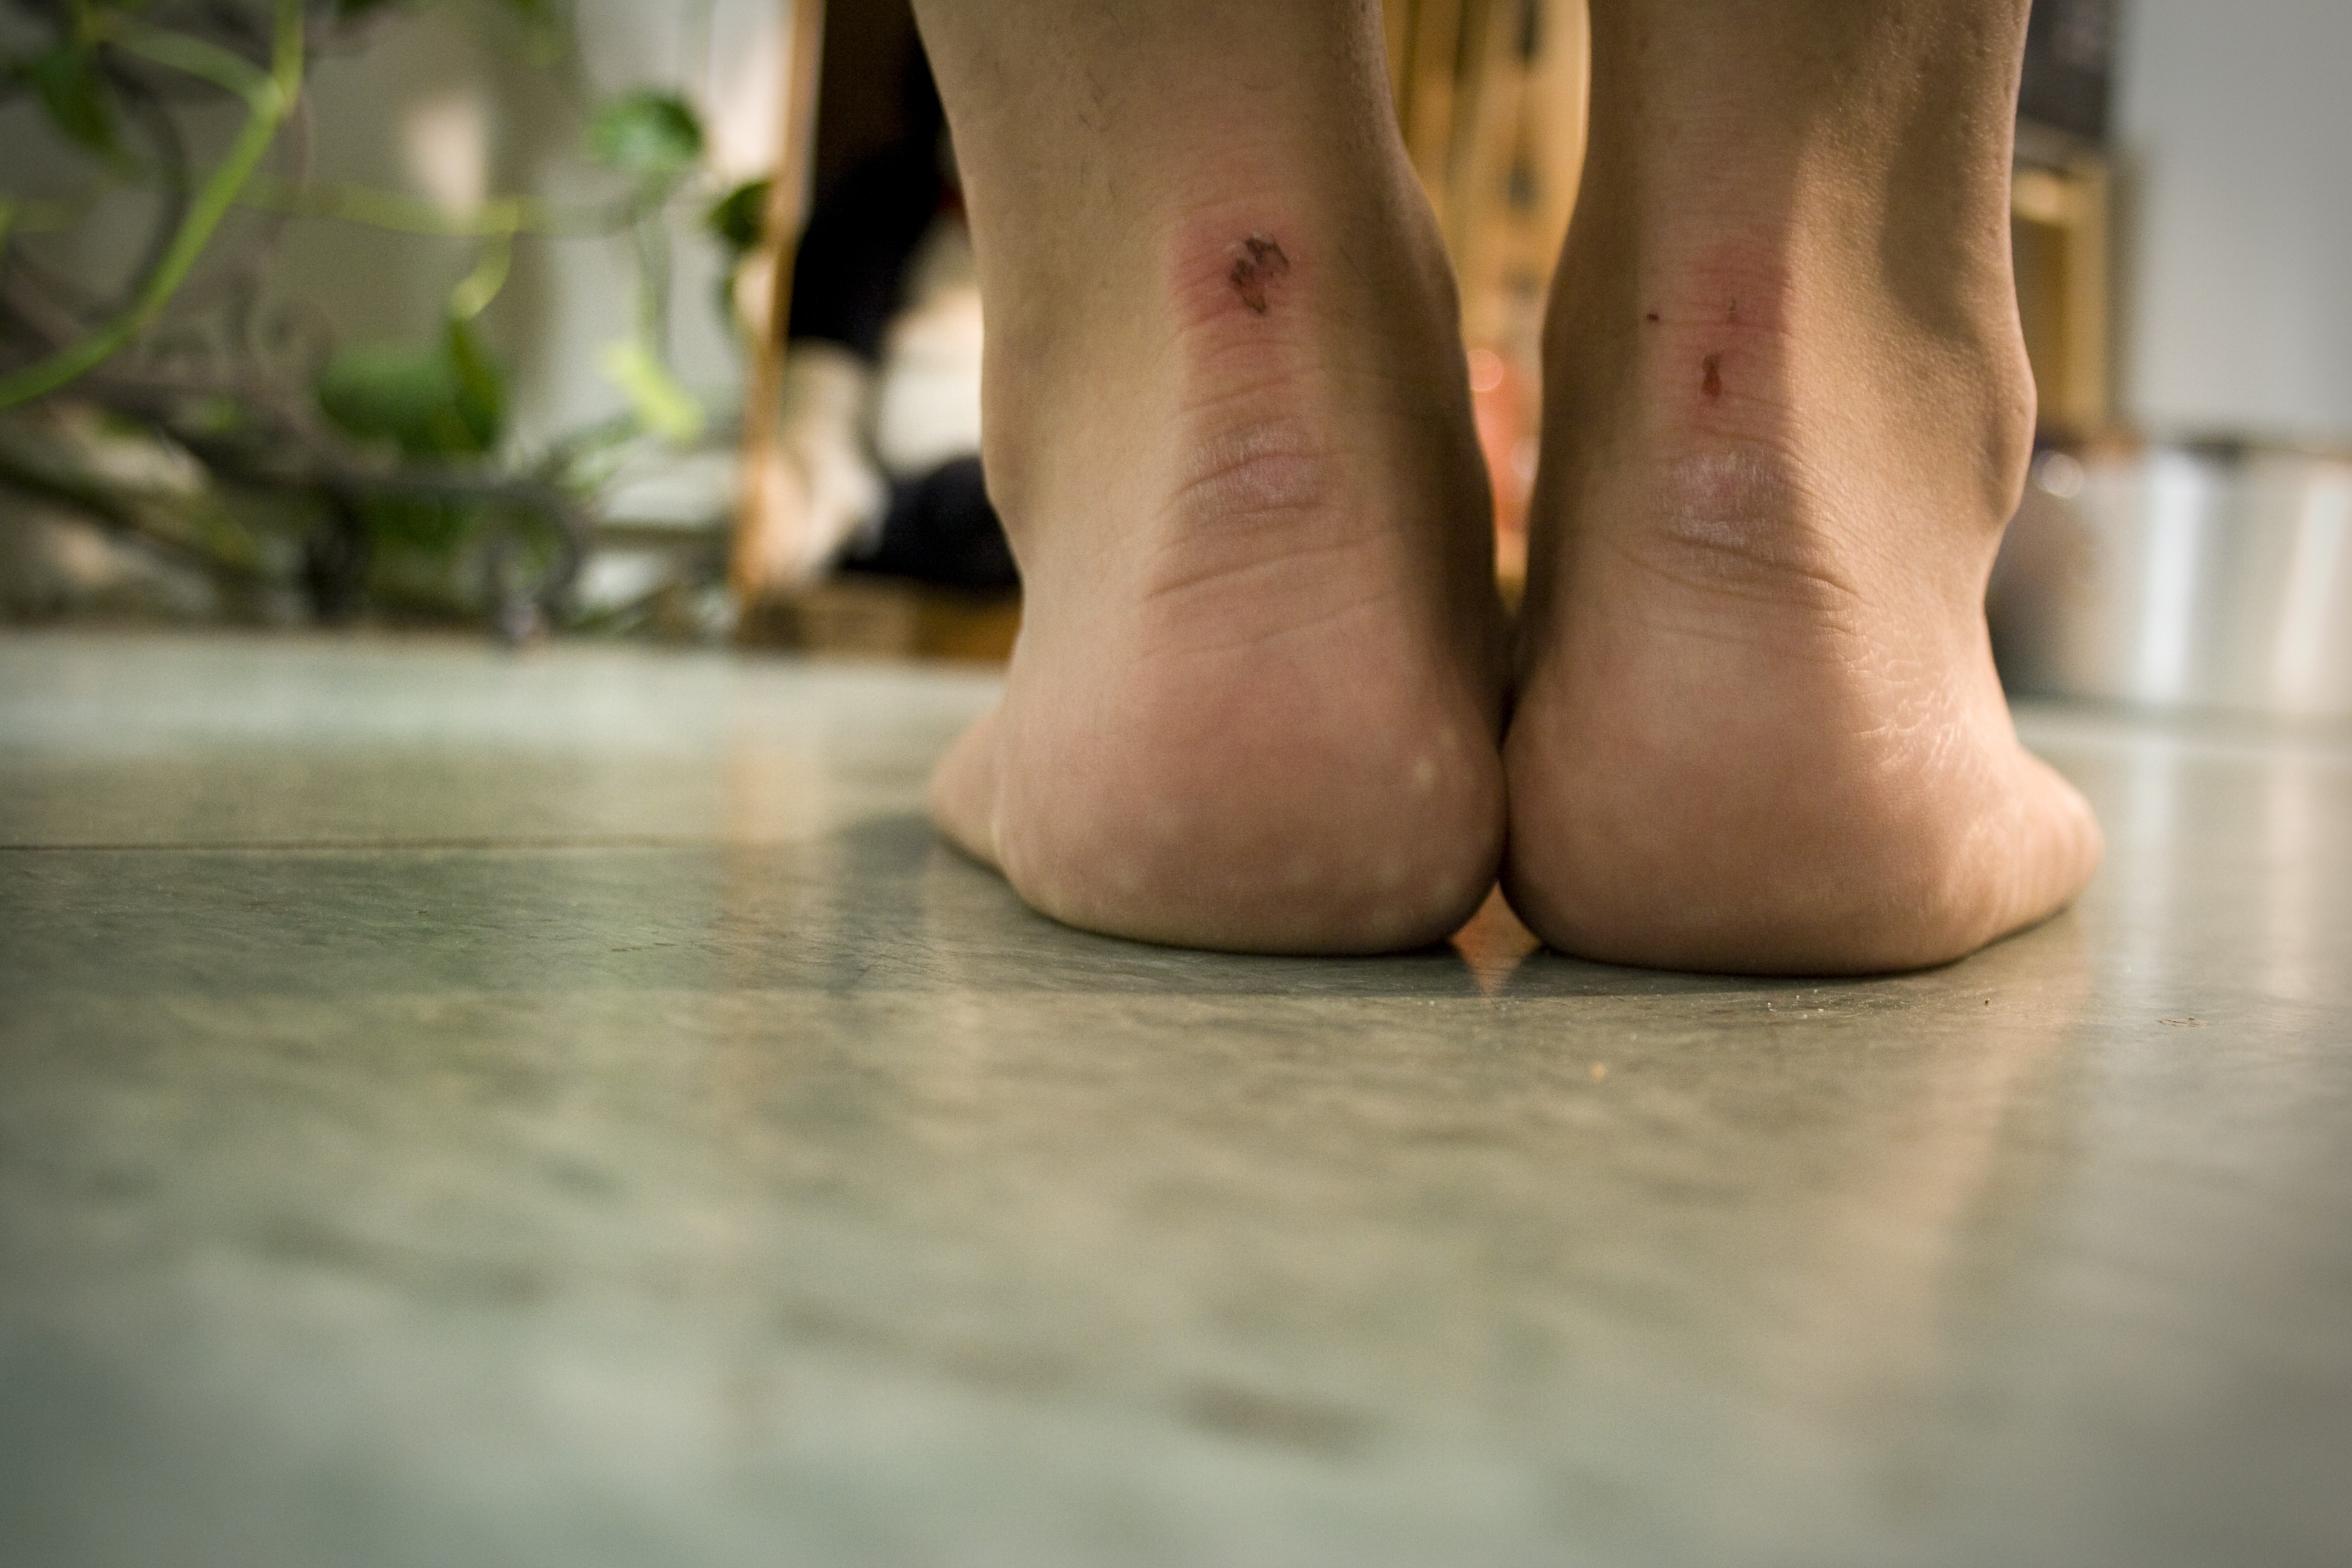 Feet hurt by bad shoe choice